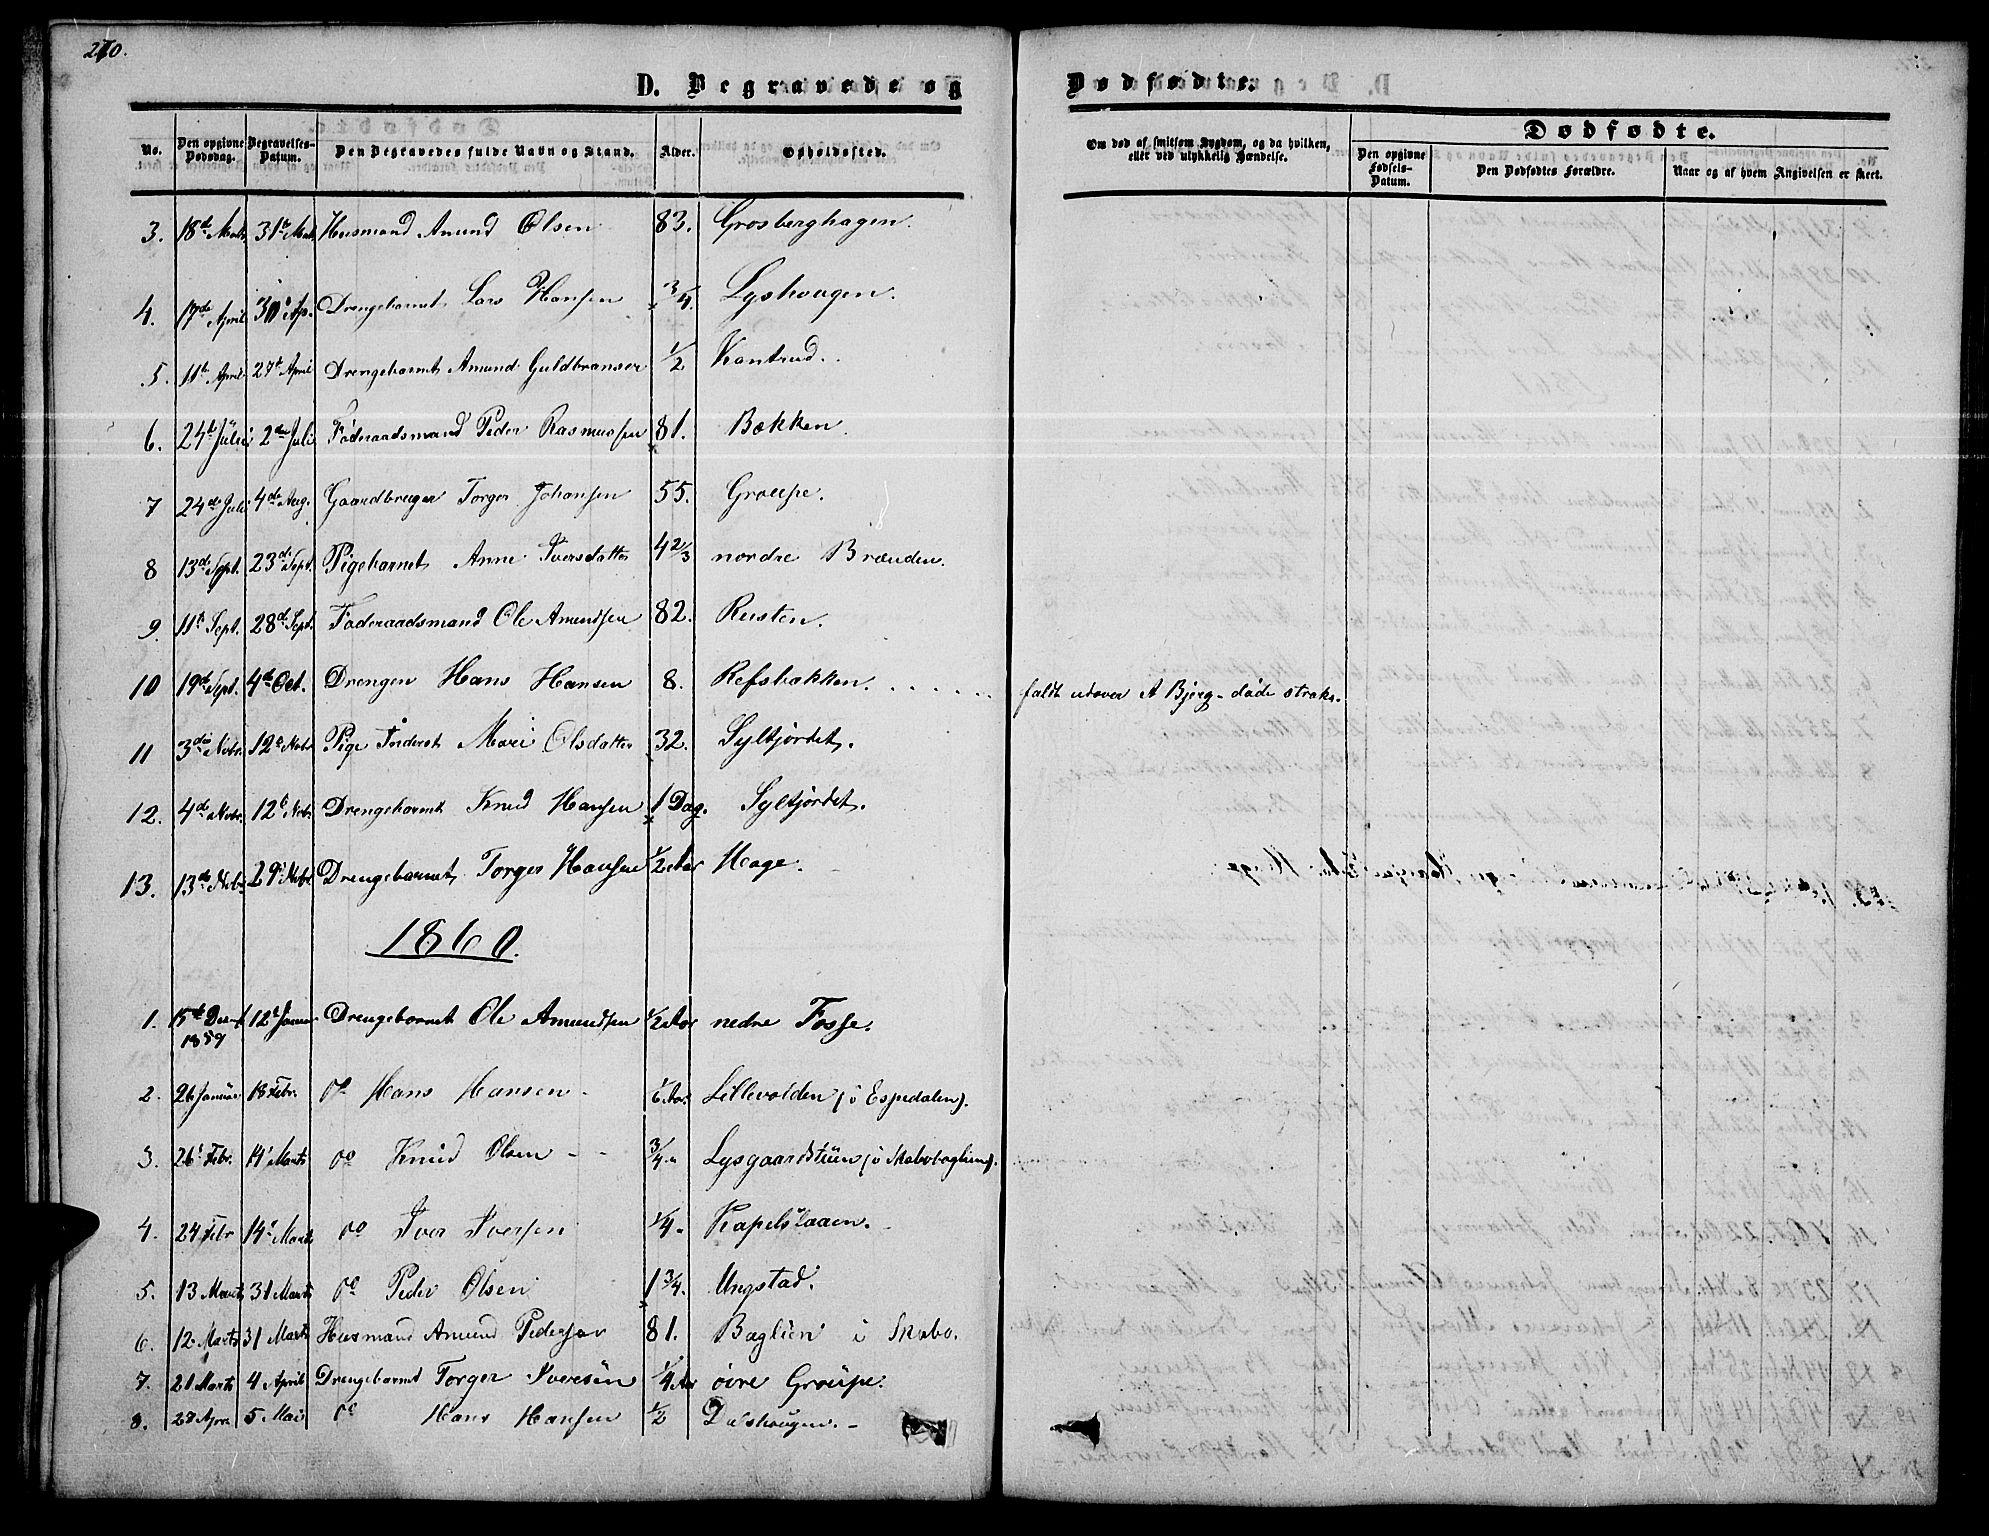 SAH, Nord-Fron prestekontor, Klokkerbok nr. 2, 1851-1883, s. 270